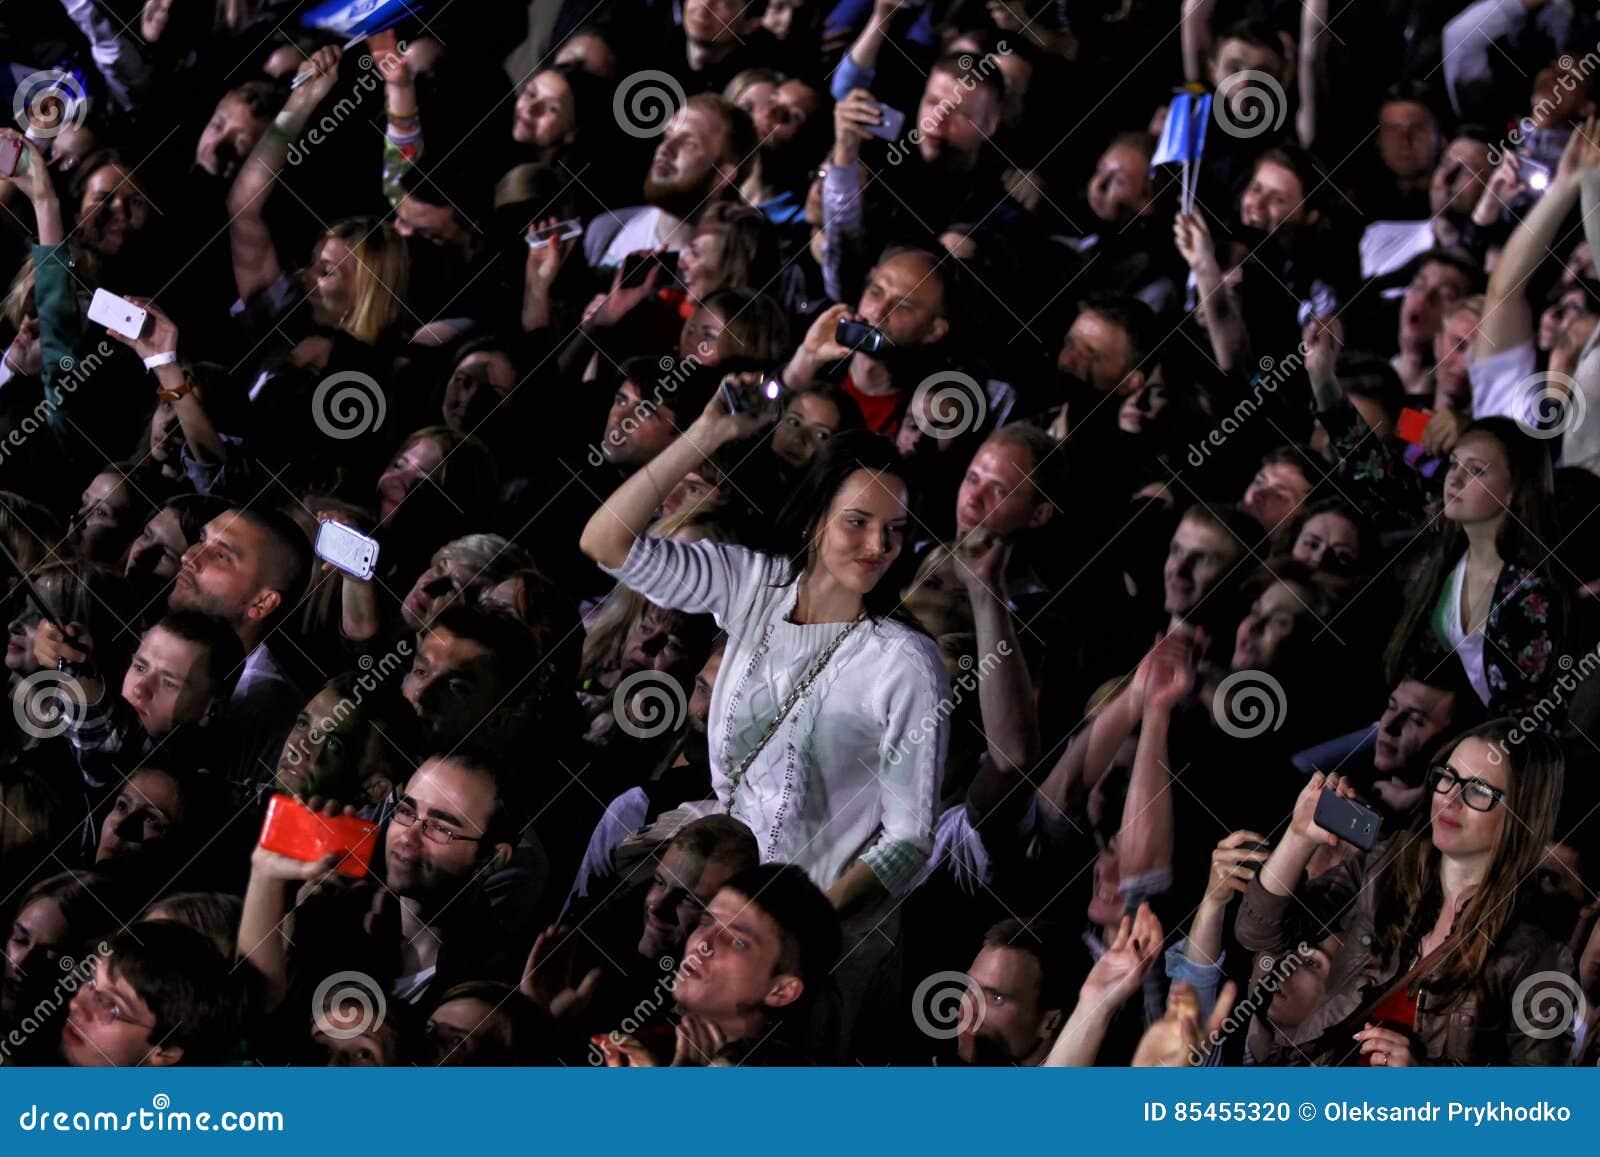 People enjoy rock-concert at a stadium